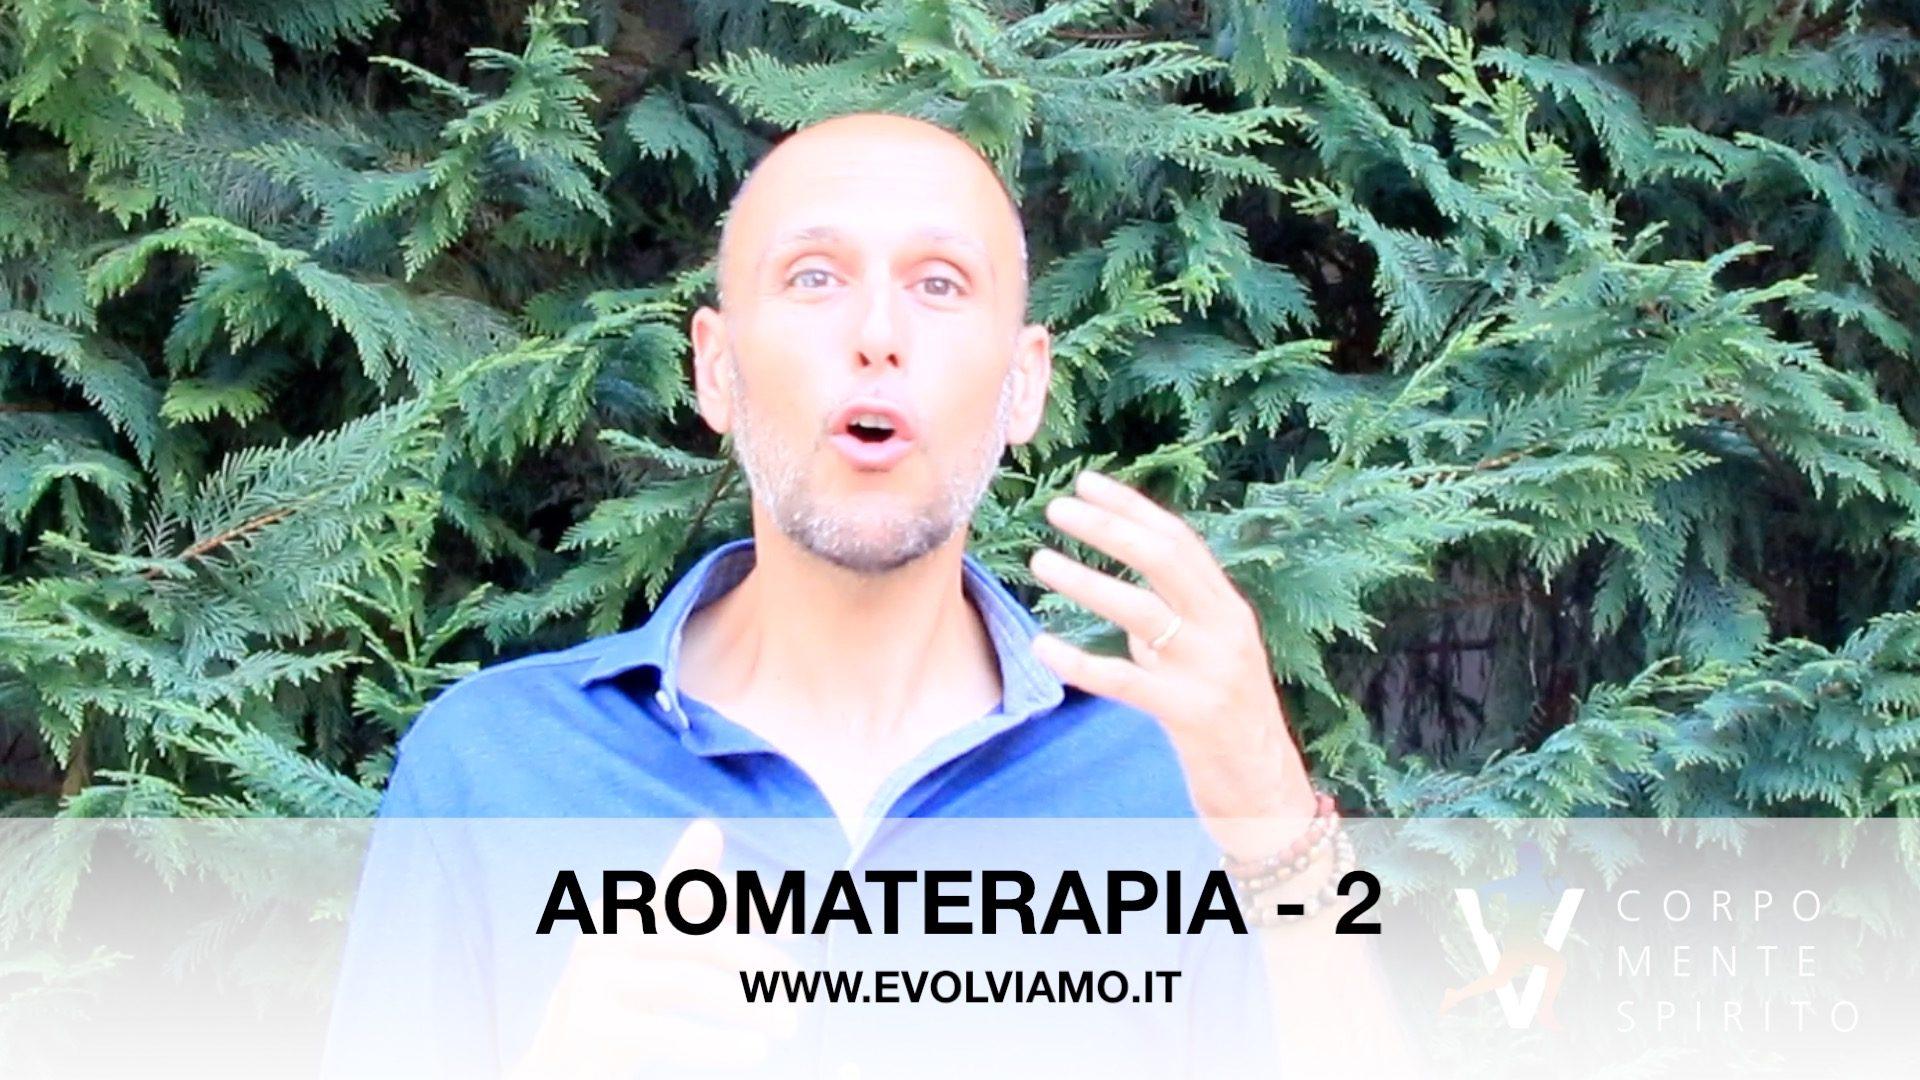 Aromaterapia 2